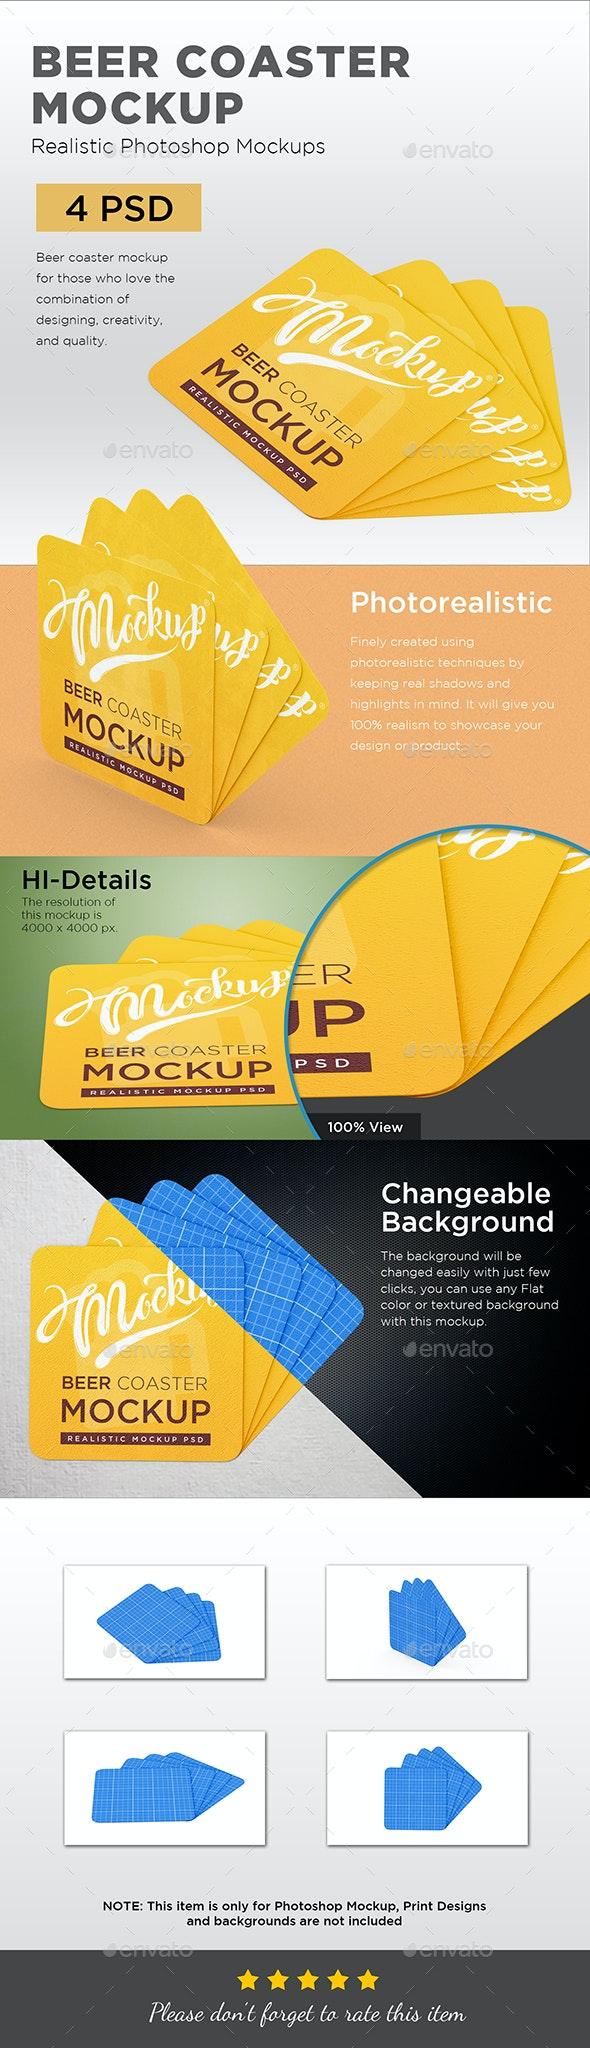 Beer Coaster Mockup - Packaging Product Mock-Ups